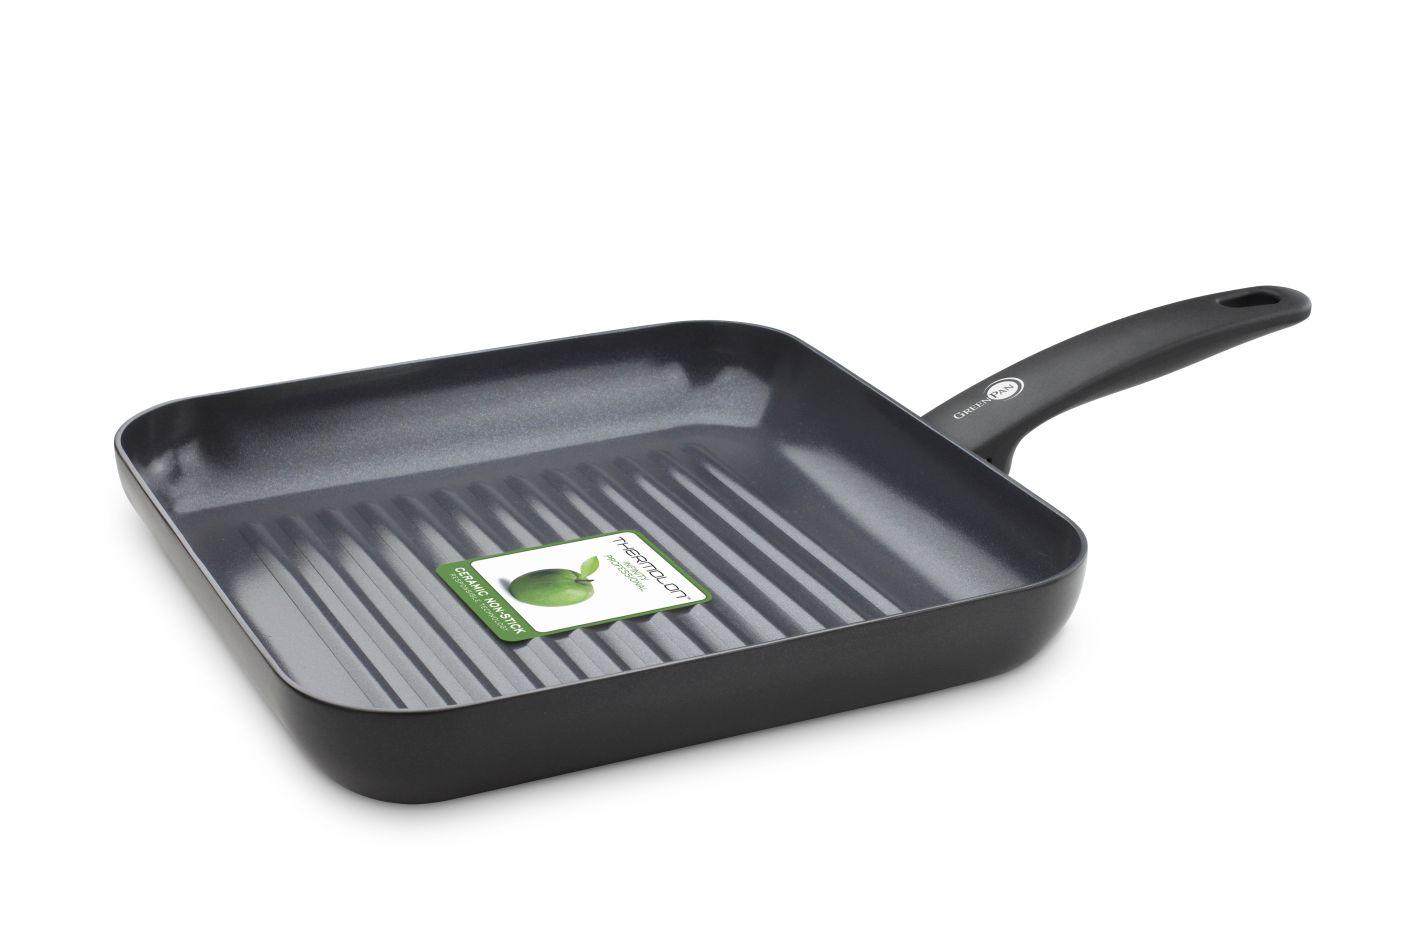 Grilovací pánev Cambridge Black 28 x 28 cm - GreenPan